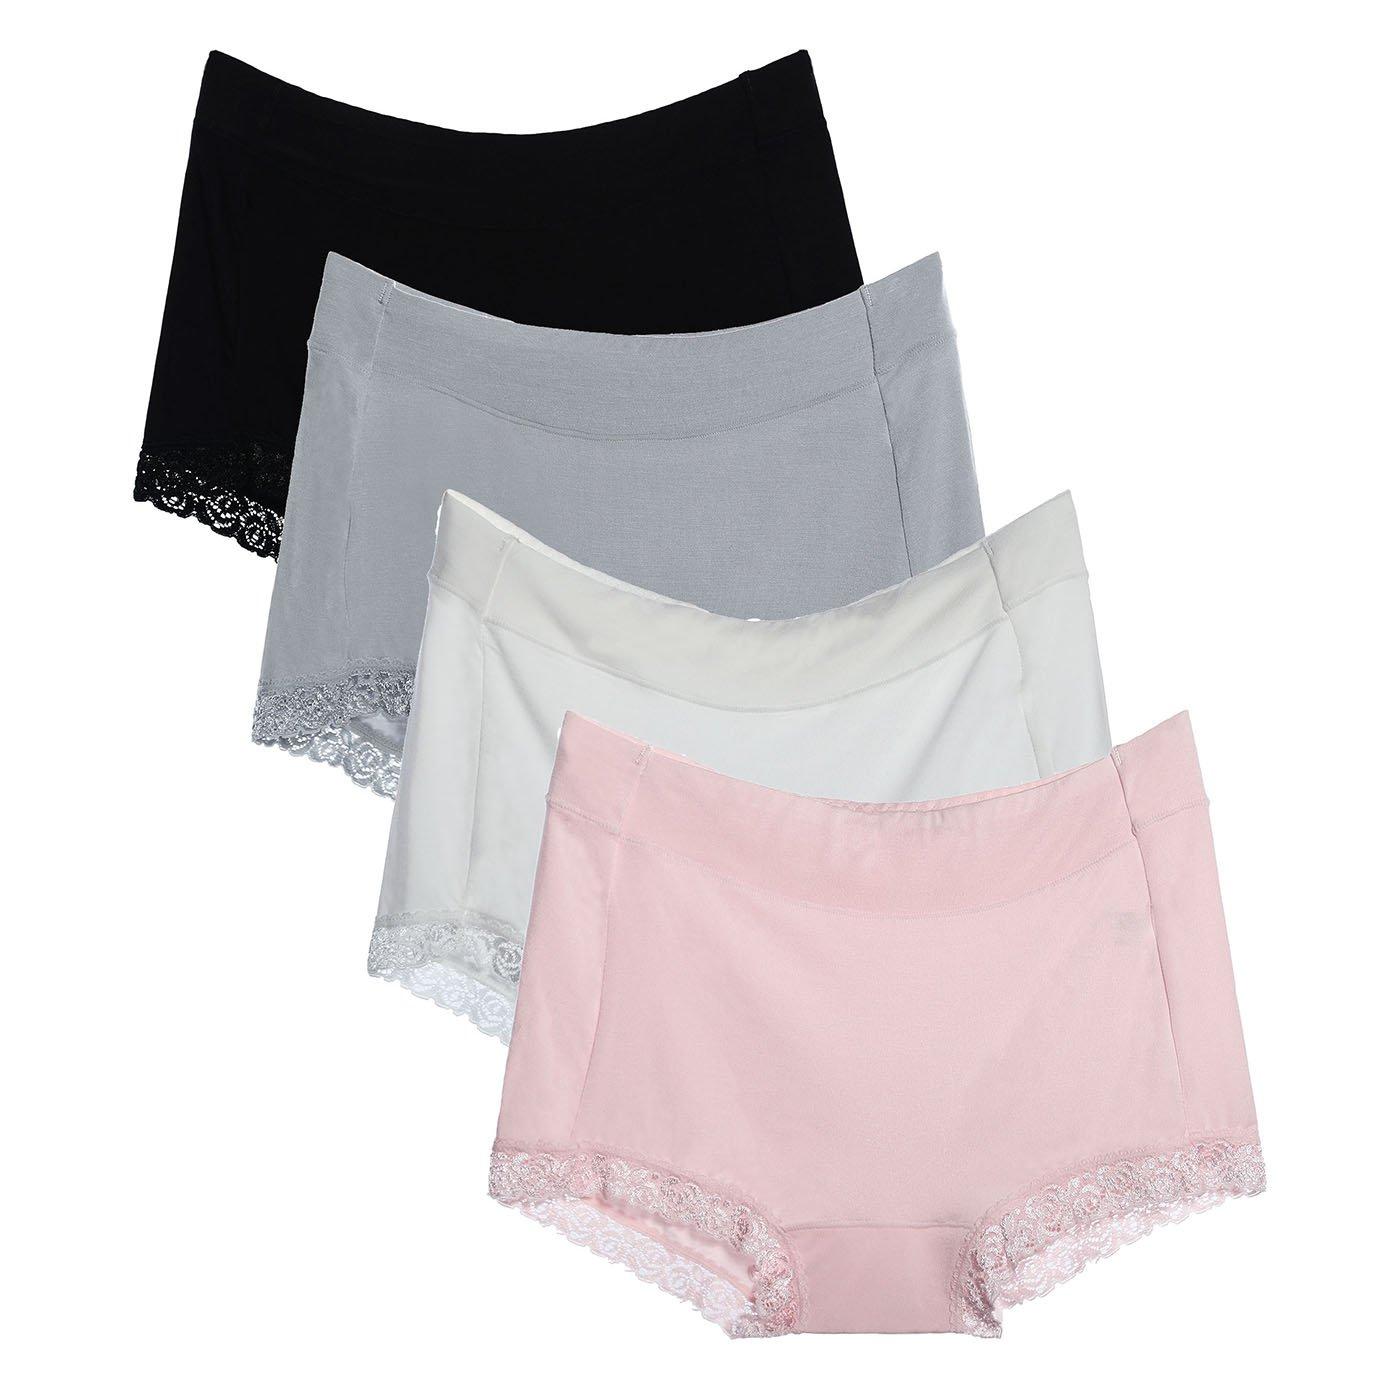 LEVAO Women Seamless Boyshort Panties Stretch Boxer Briefs Soft Panties 4 Pack